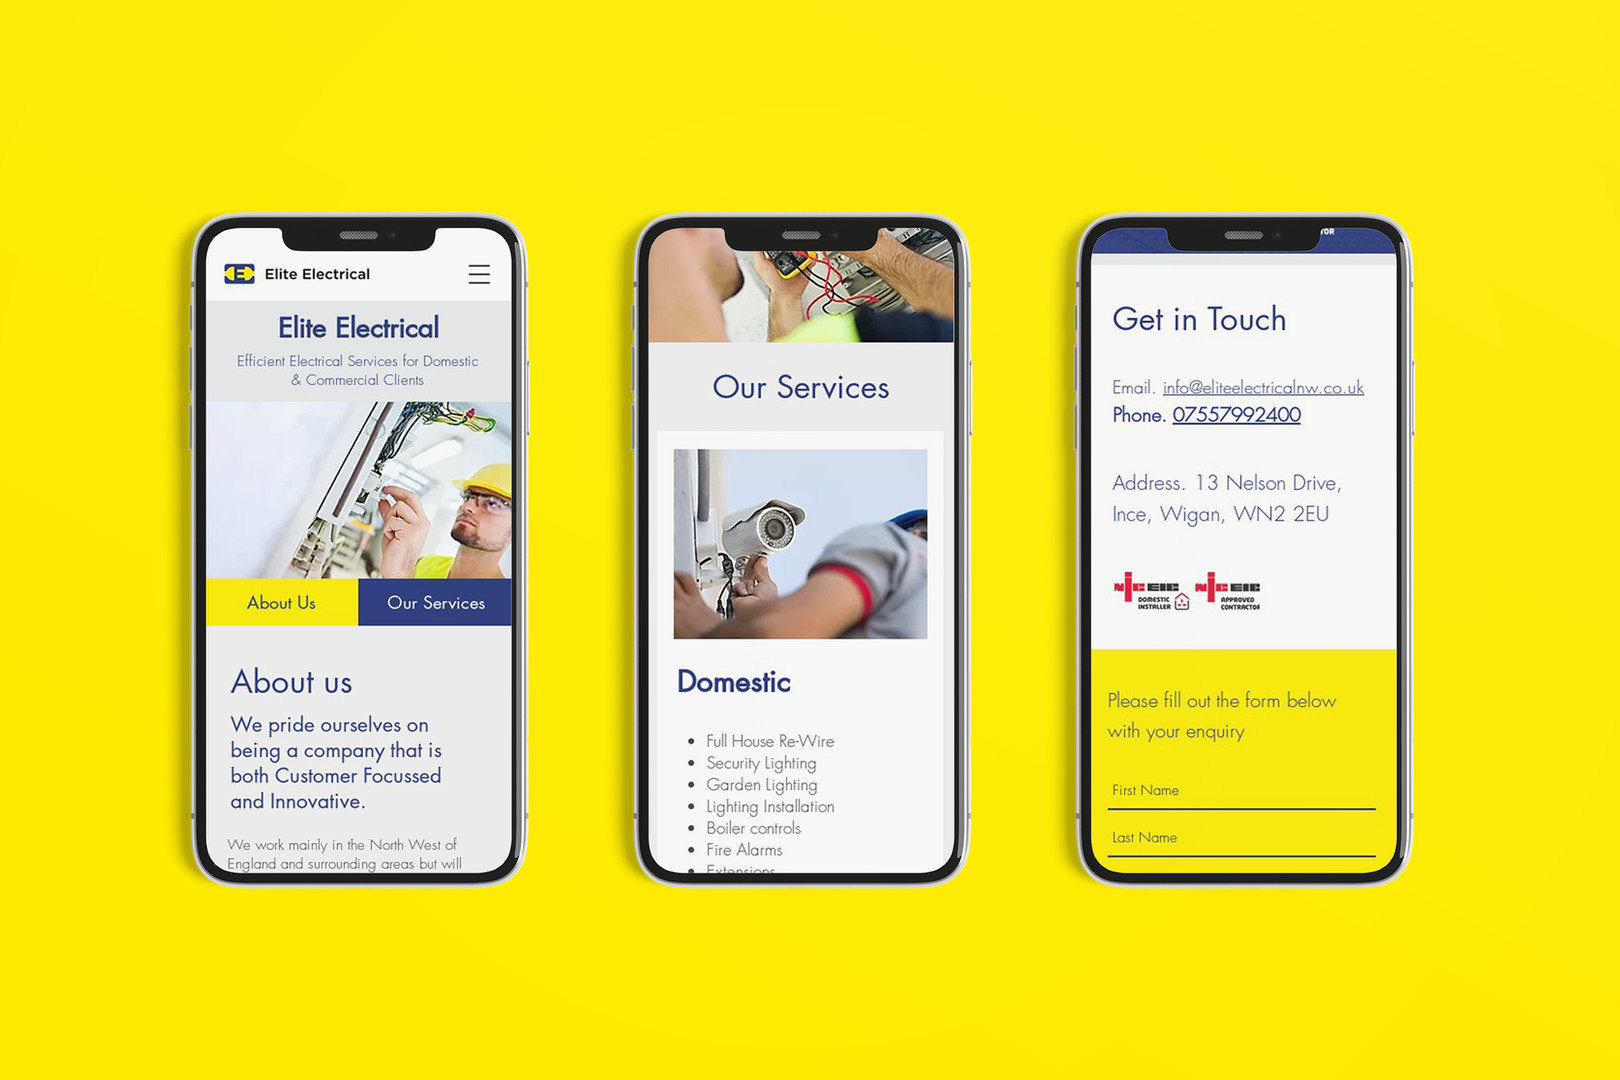 web-app-3-screens-elite-electrical-web-d